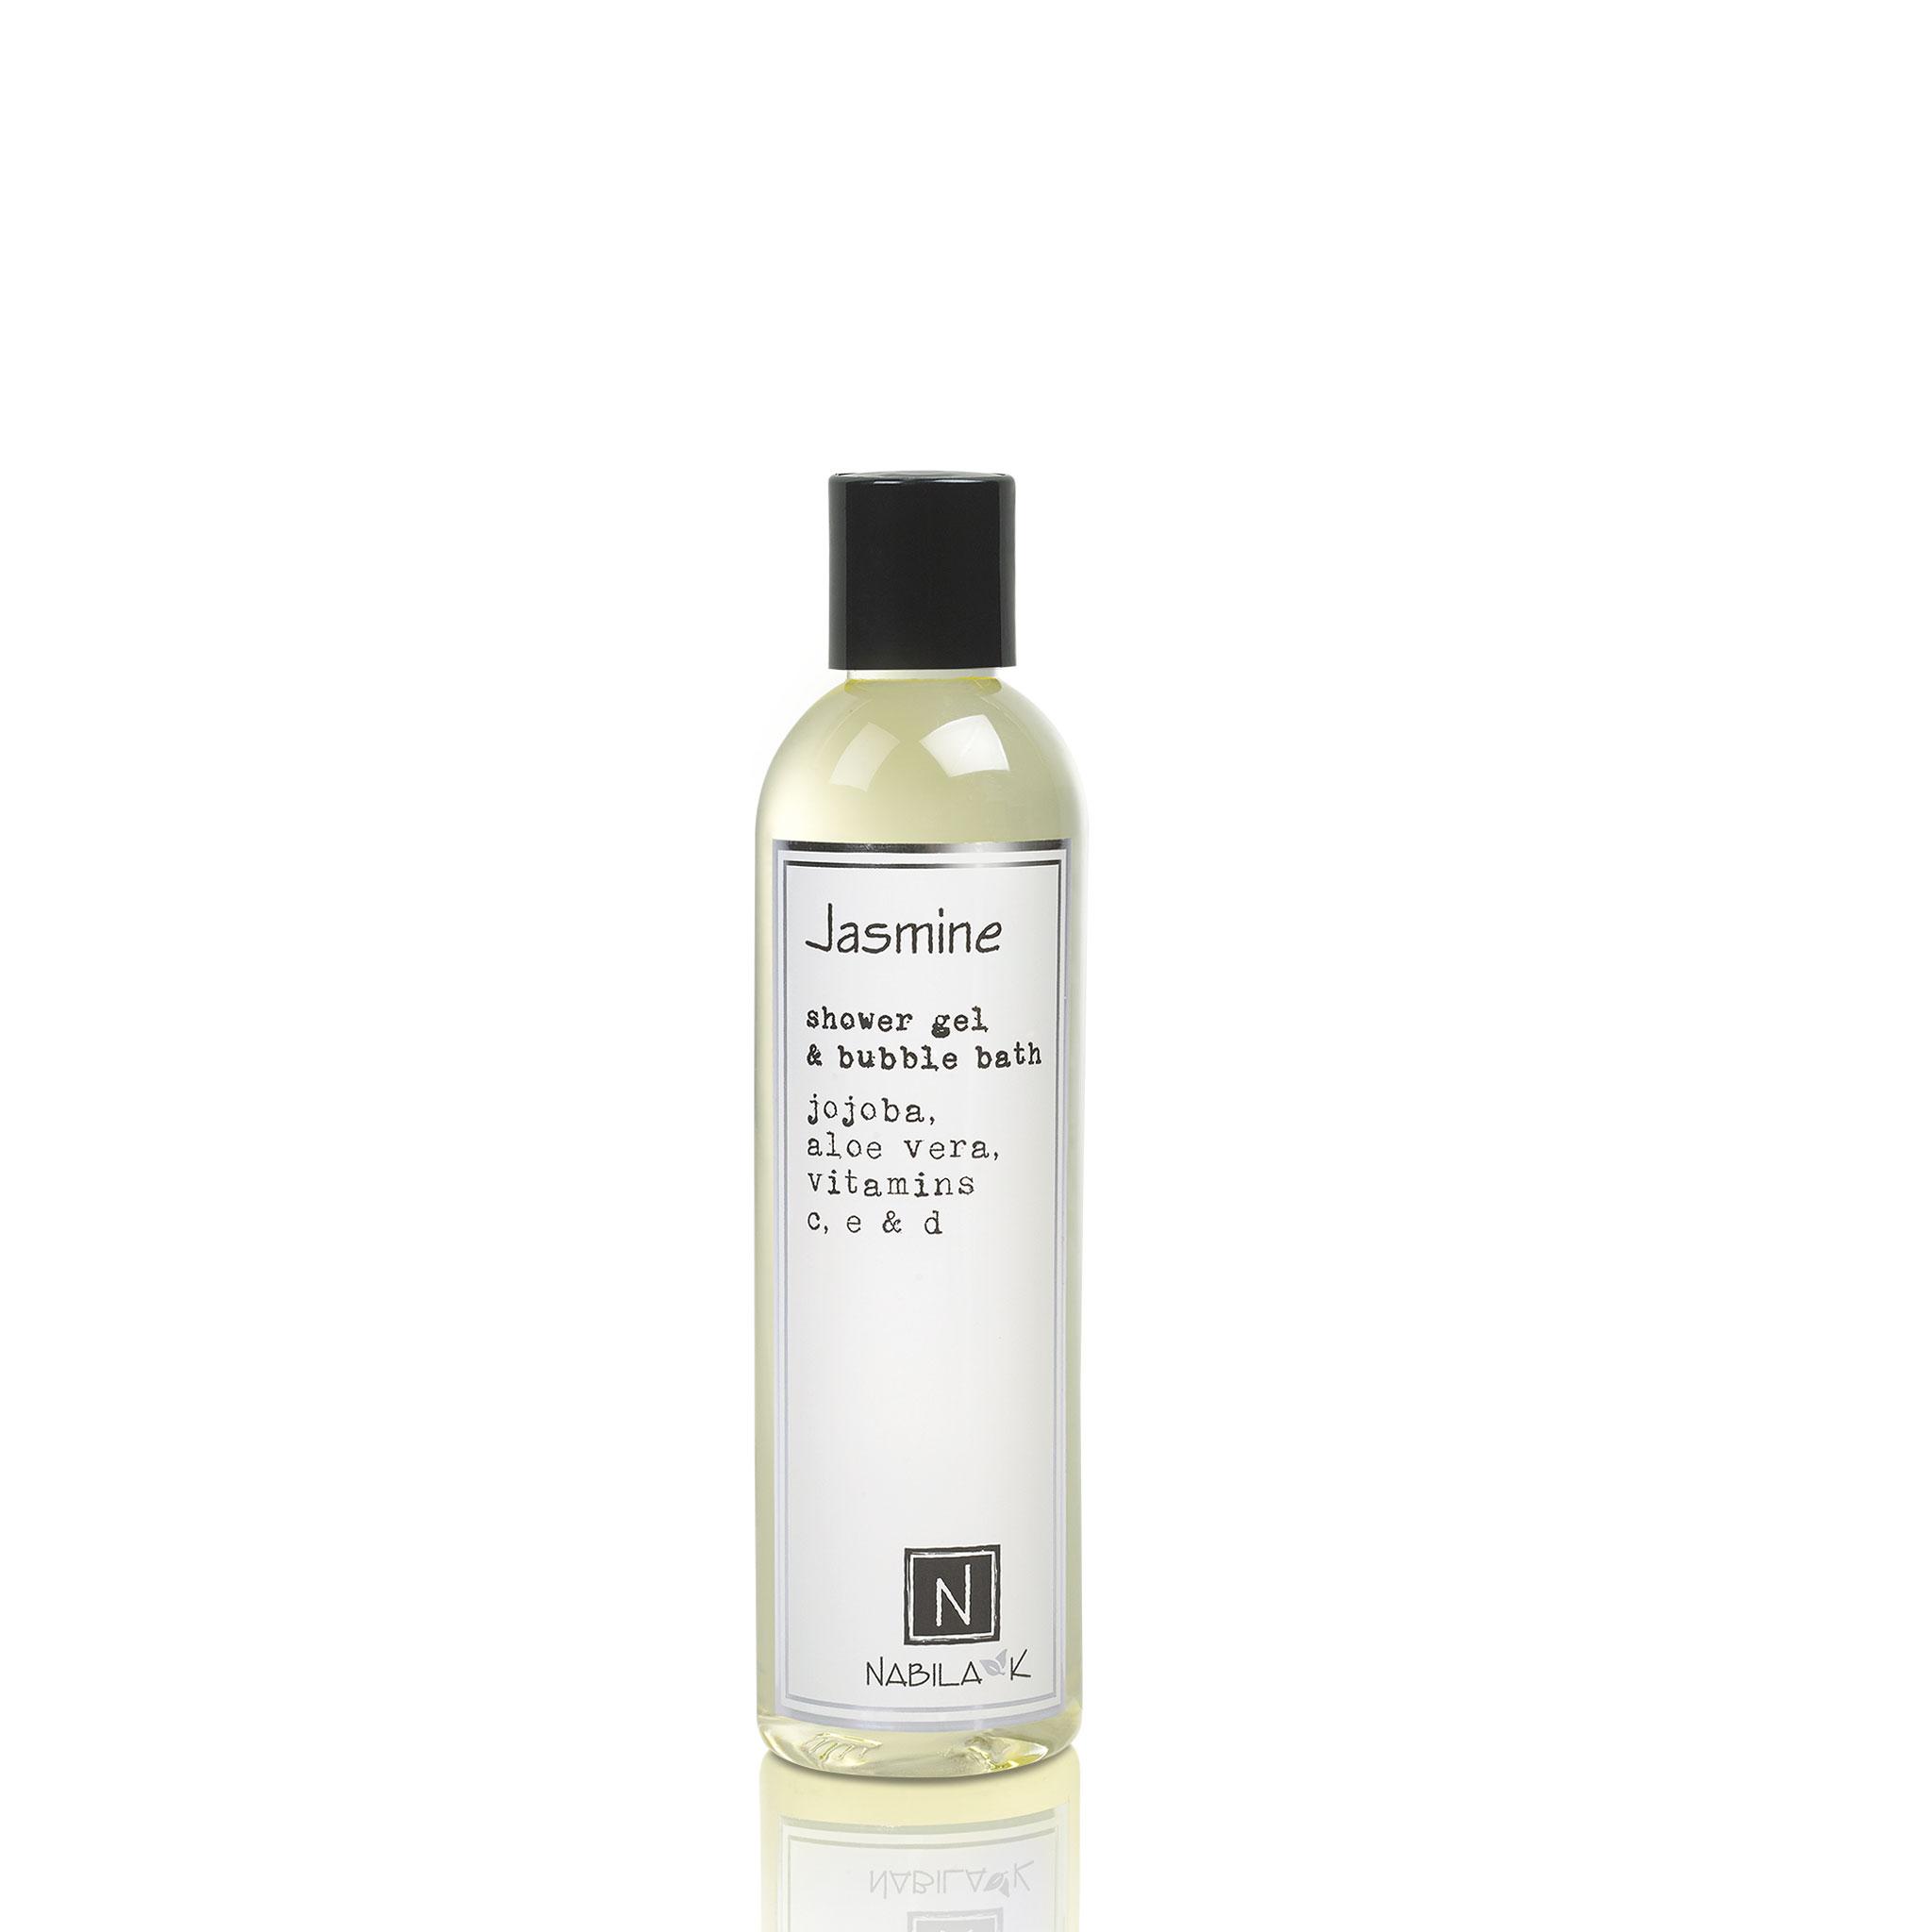 One Large Size Version of Nabila K's Jasmine Shower Gel and Bubble Bath Jojoba, Aloe Vera, Vitamins C, E, & D